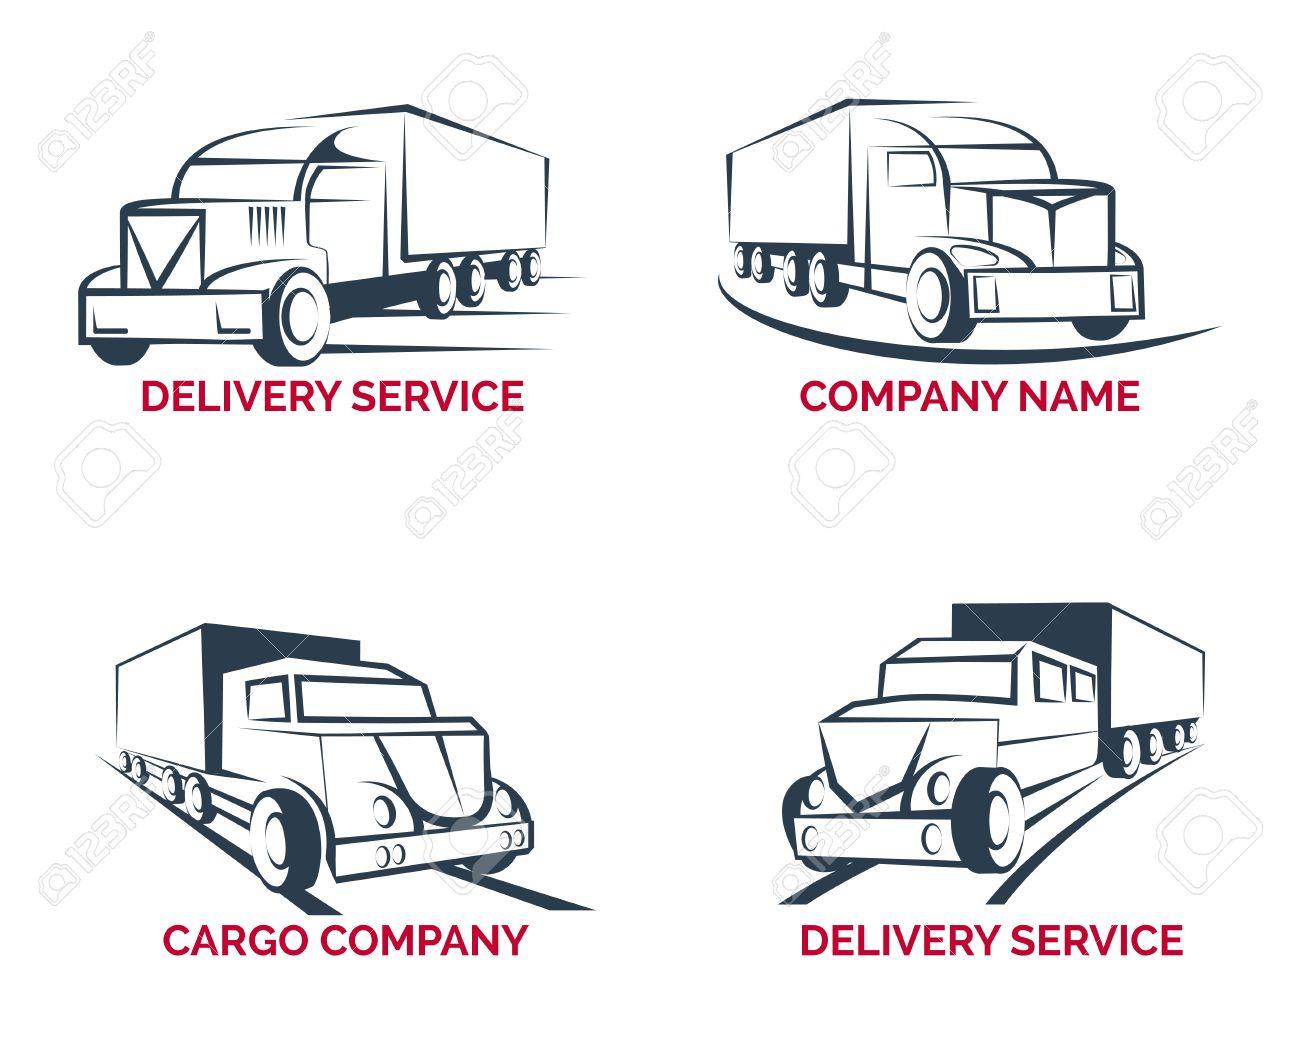 47823234 cargo truck delivery service logo templates set transportation van vehicle freight vector illustrati cargo truck delivery service logo templates set transportation